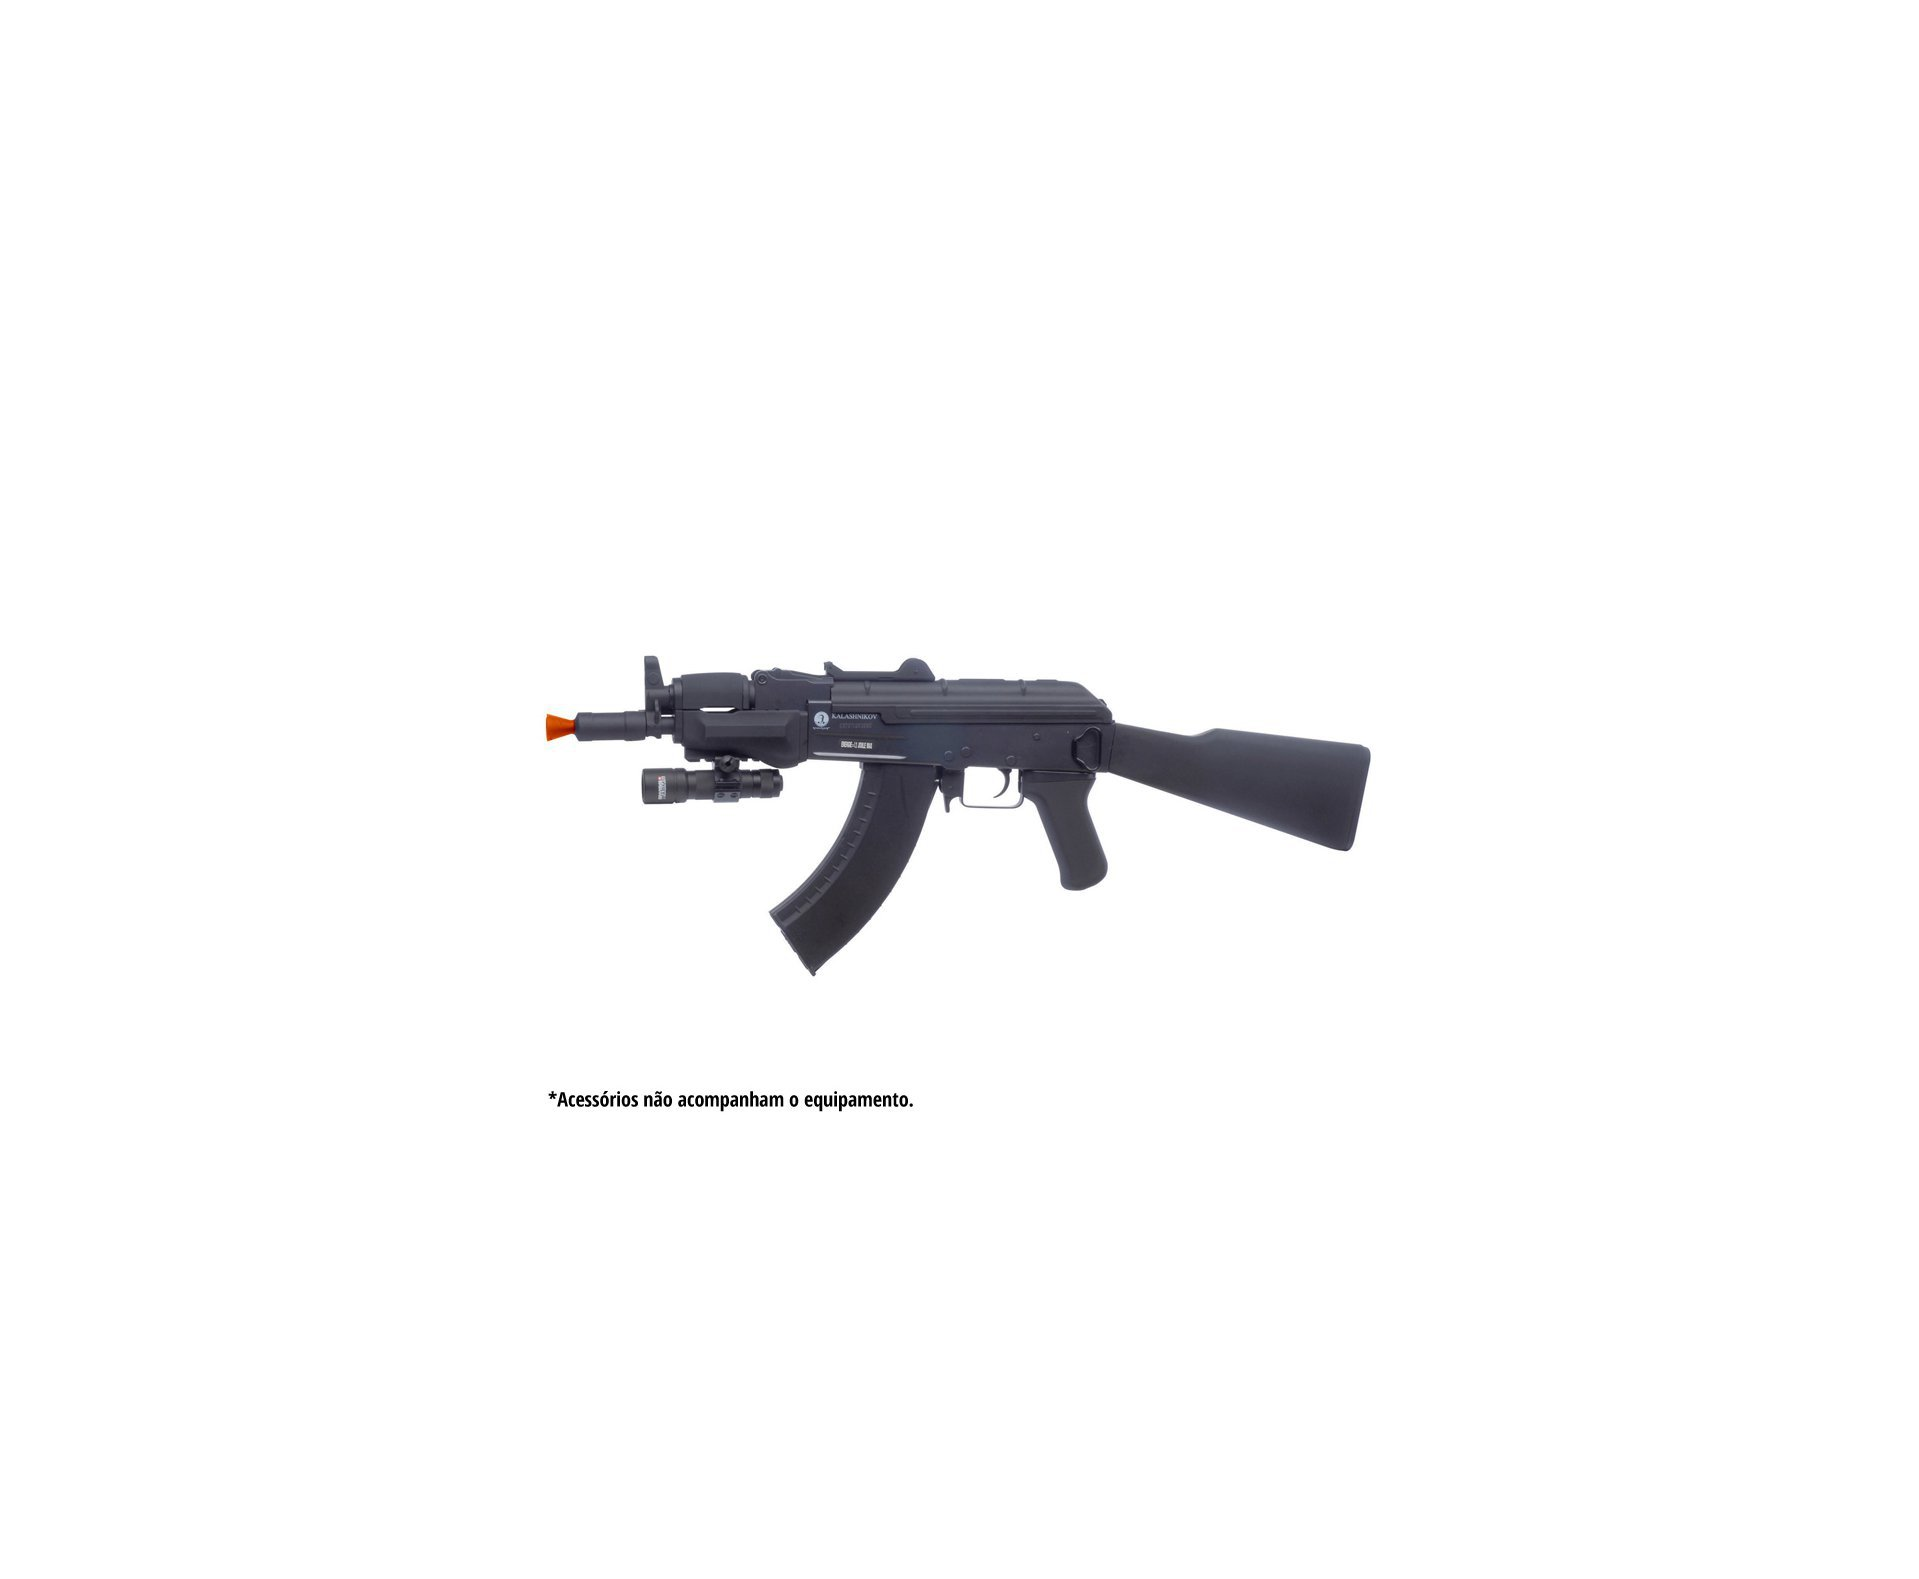 Rifle De Airsoft Spetsnaz Full Metal + Bota Tatica Cano Alto Preta 40 + Esfera 0,20g Bb King